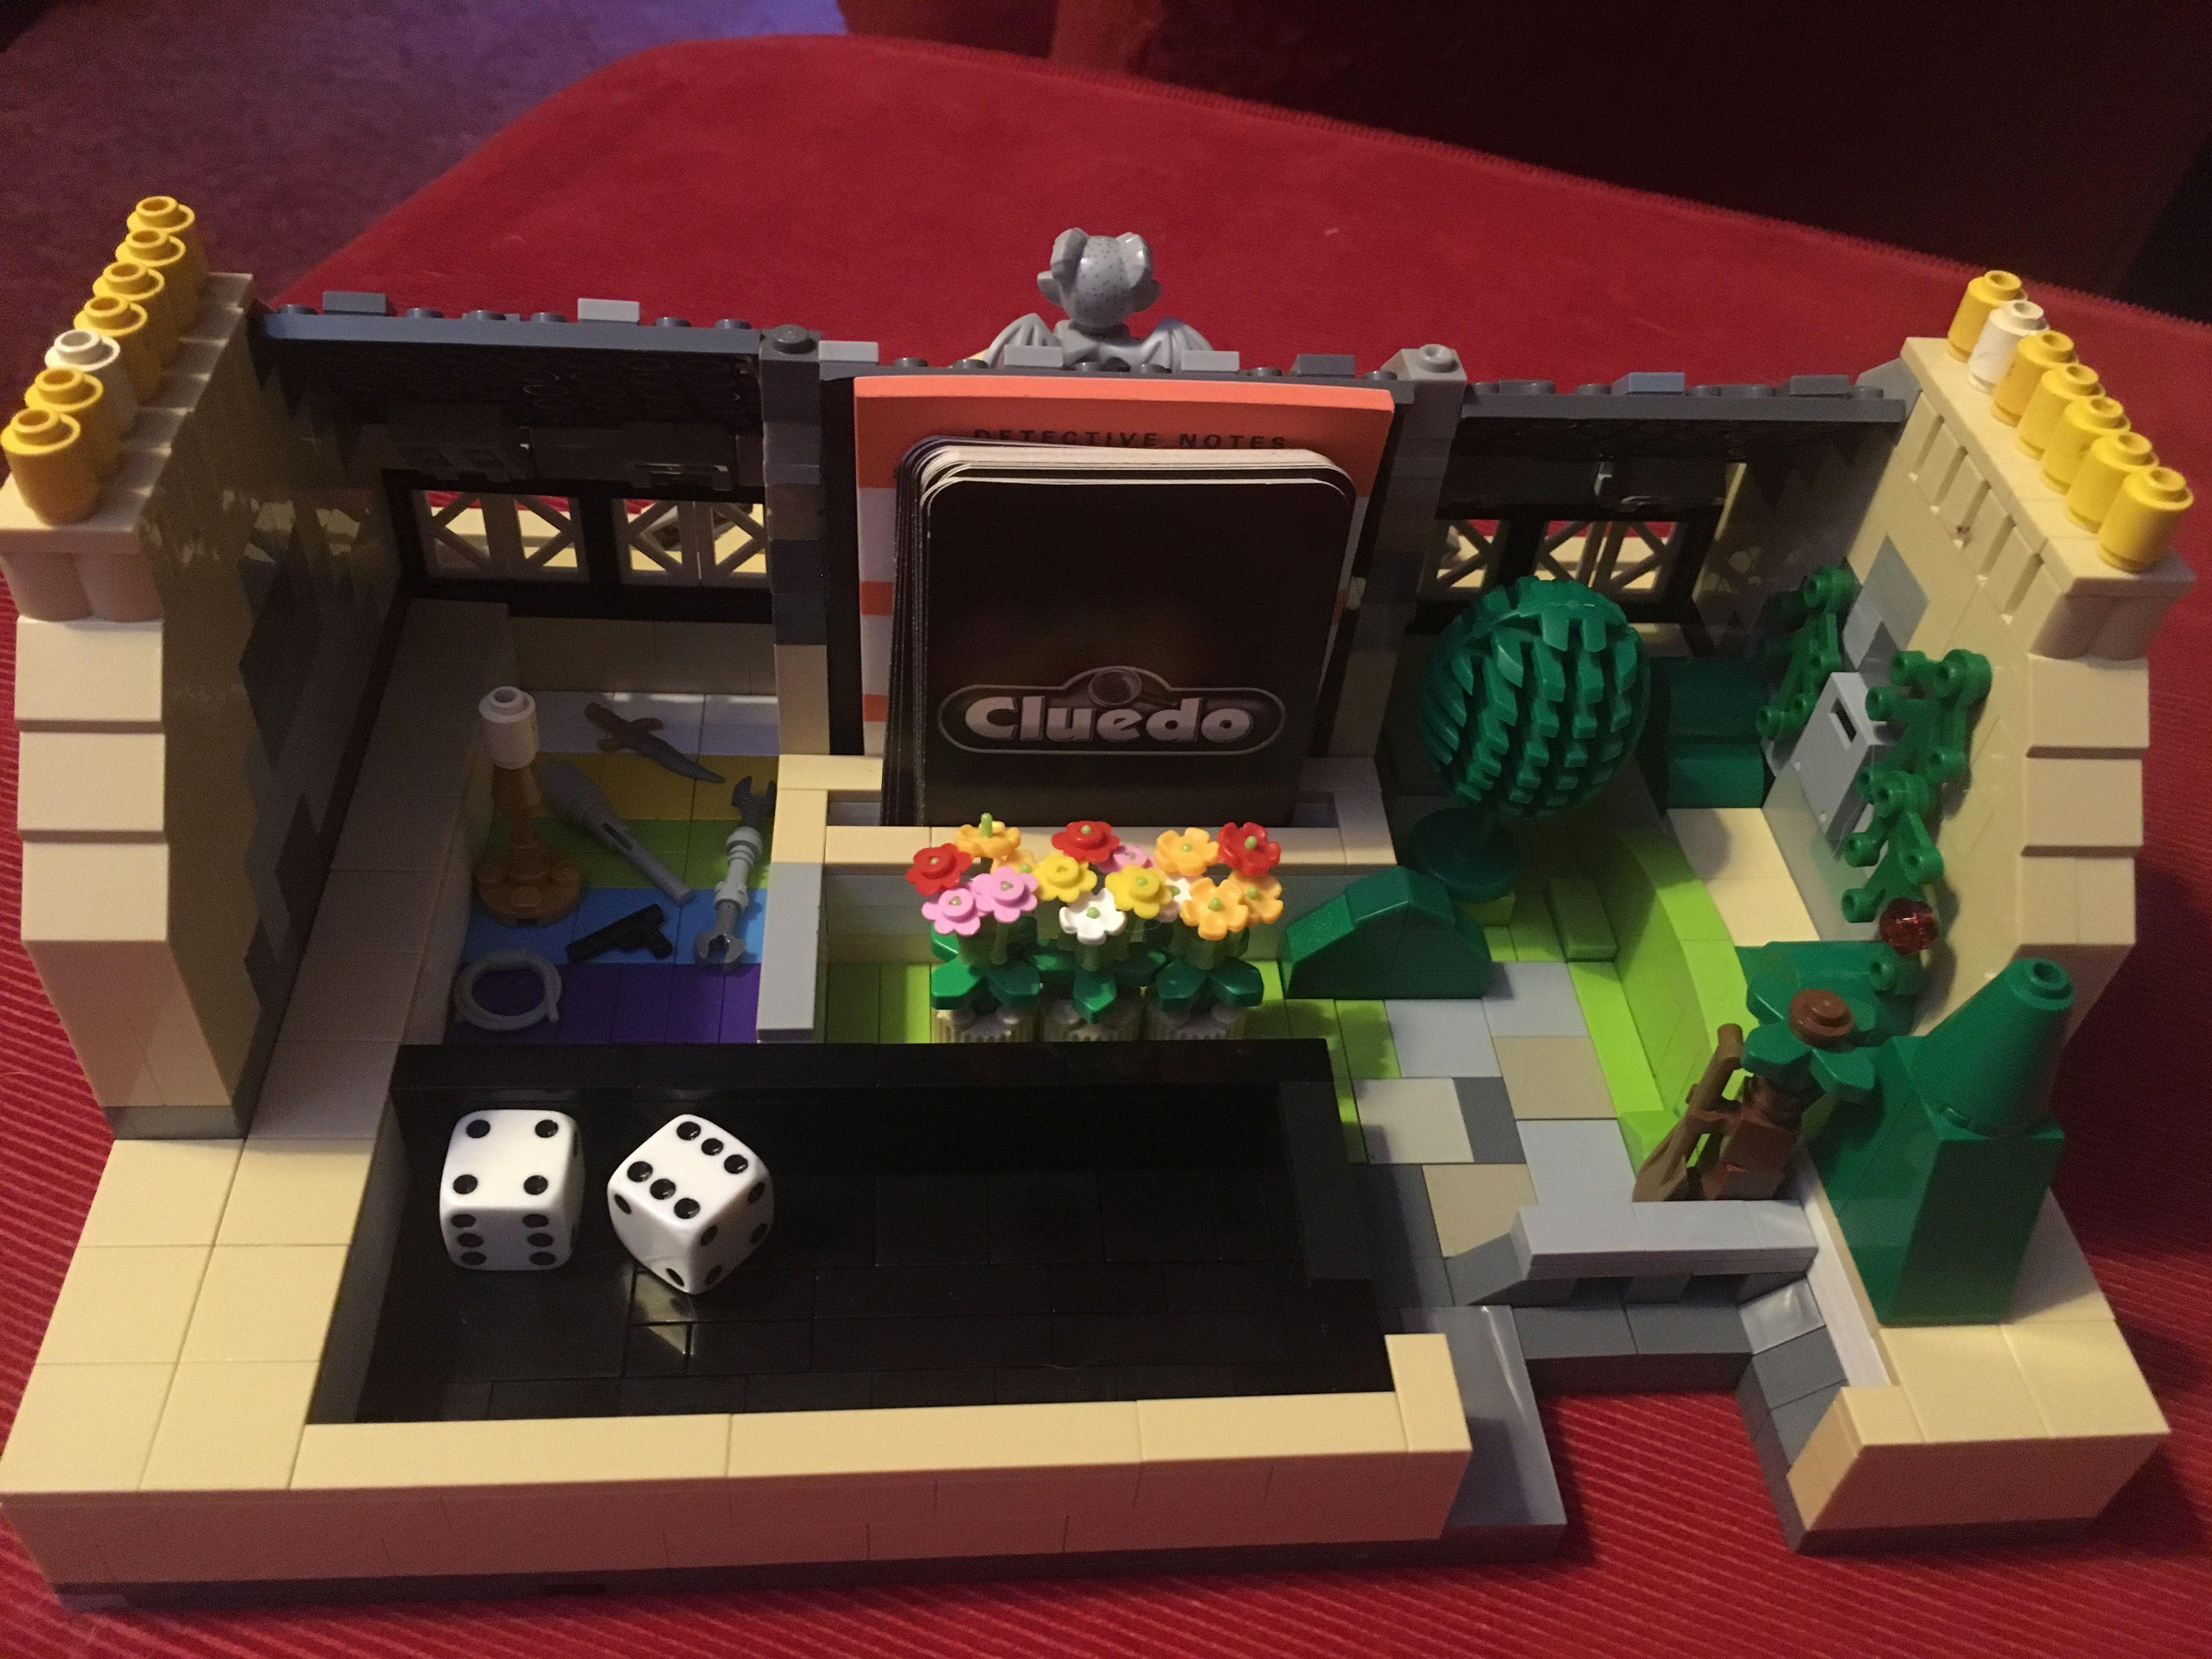 Pin by Darren PortchBurgess on Lego modular building